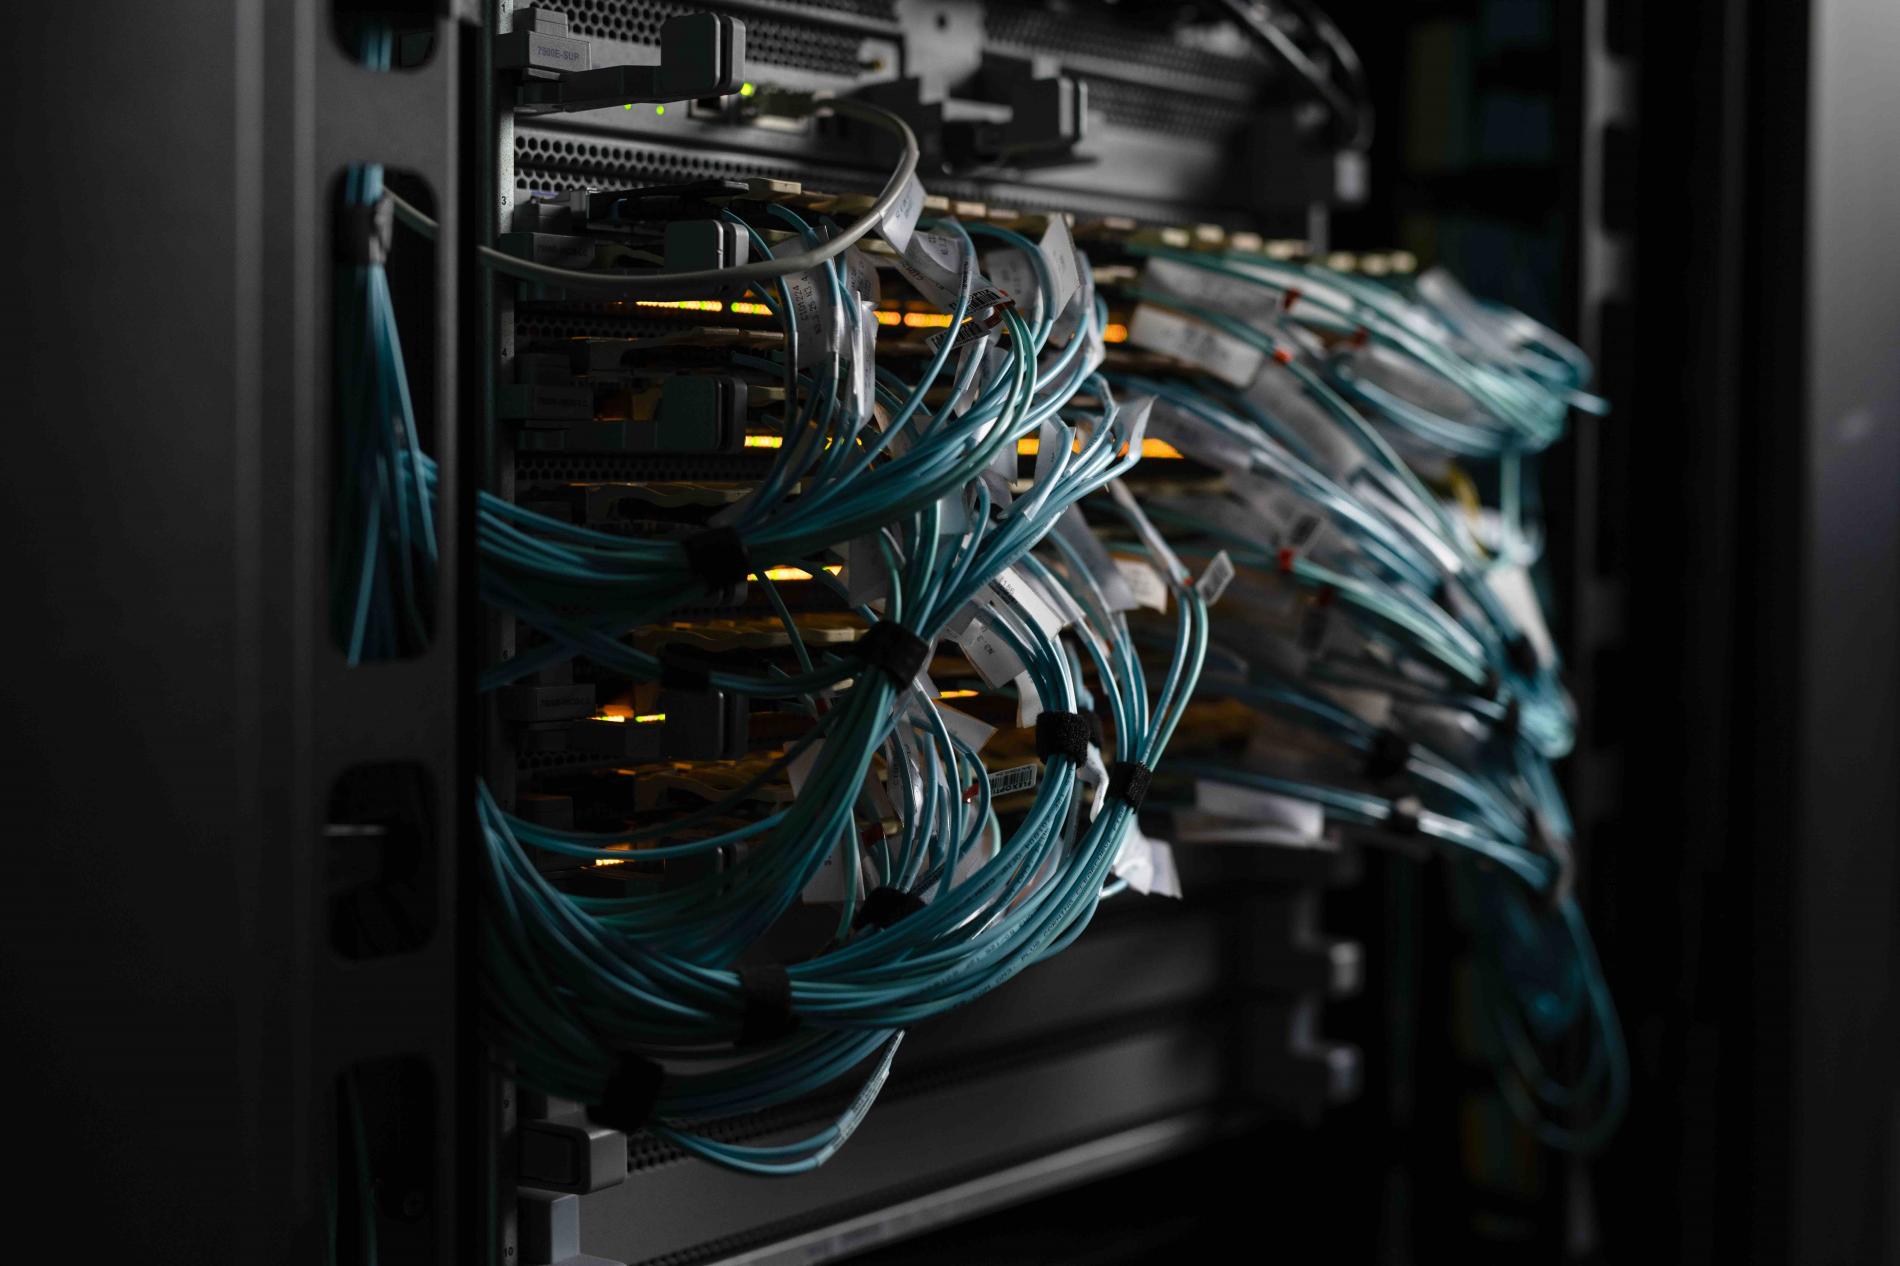 DC cables